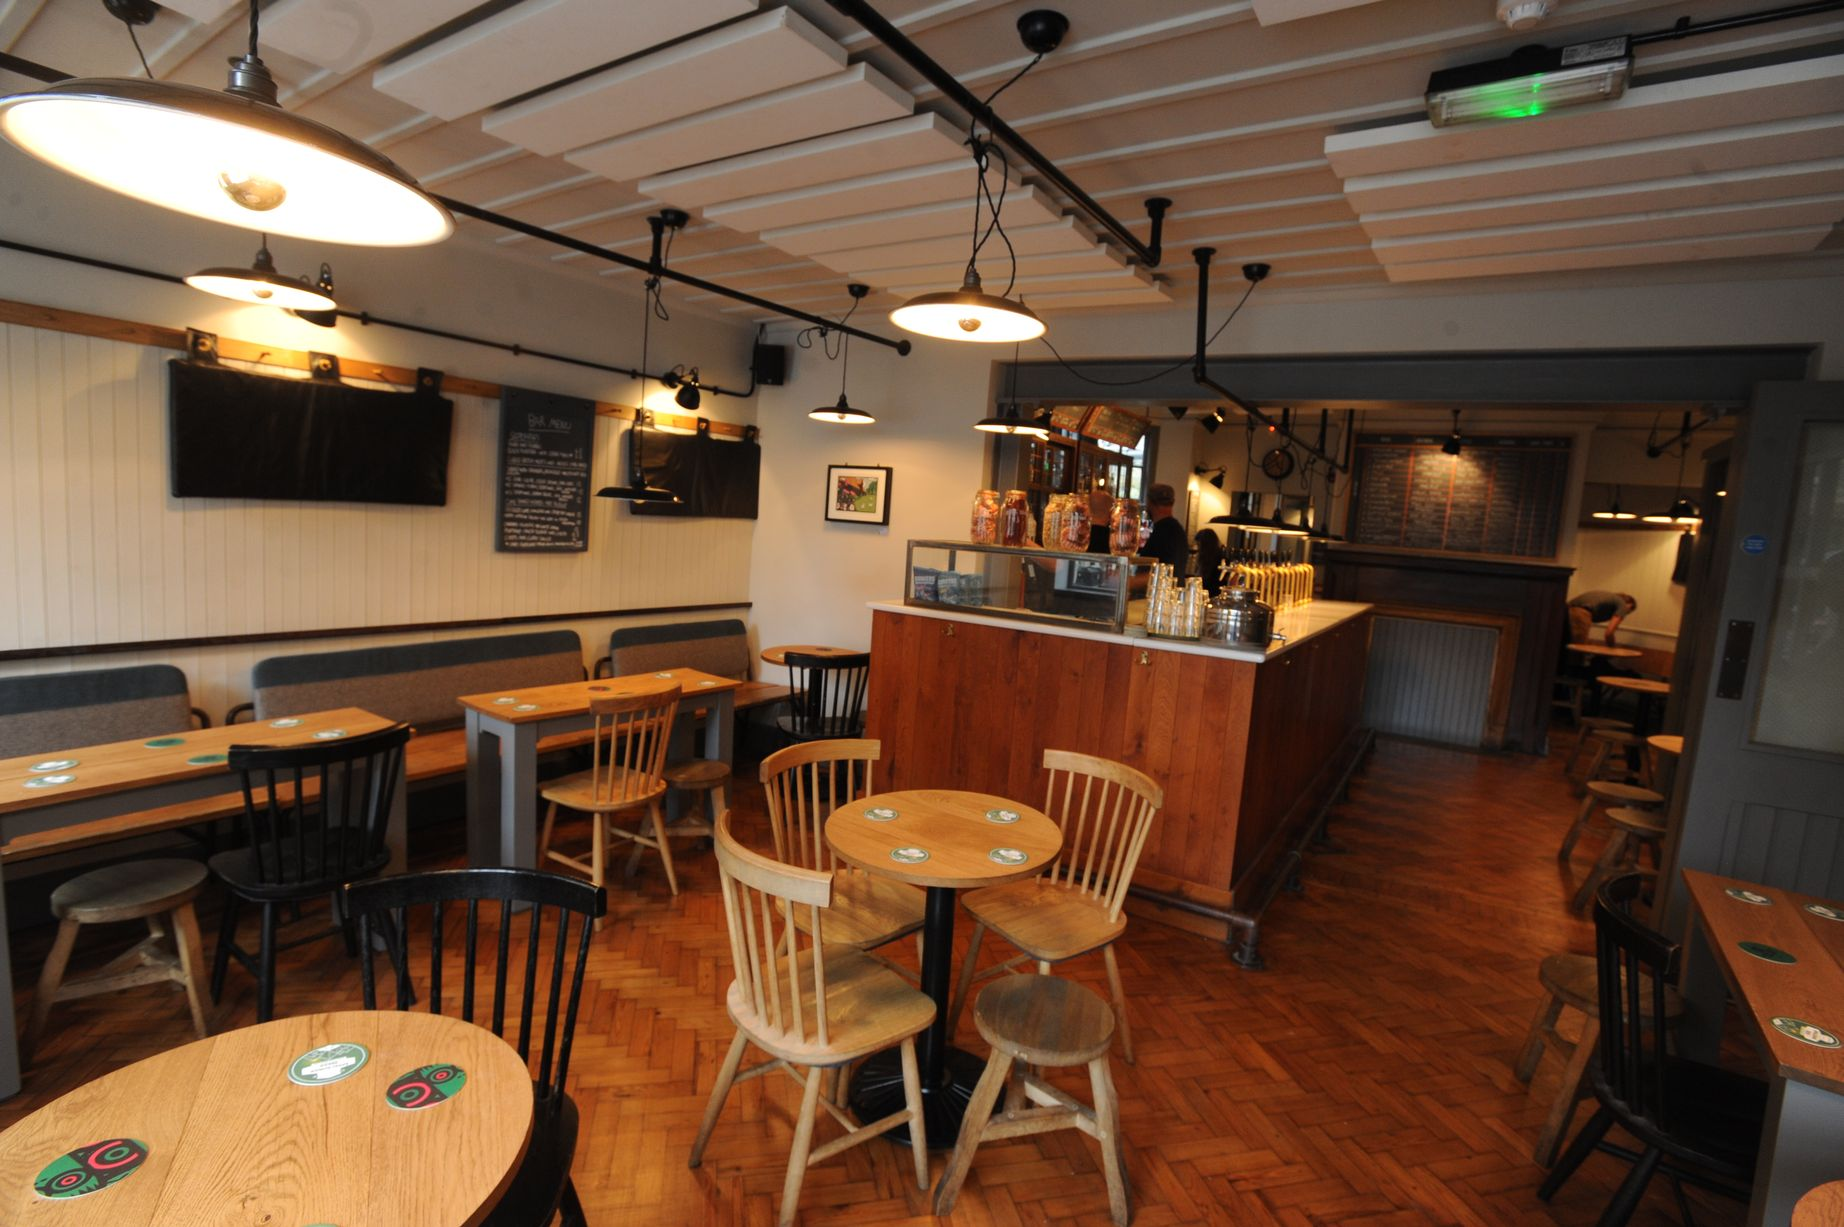 Pint Shop - £15 food offer